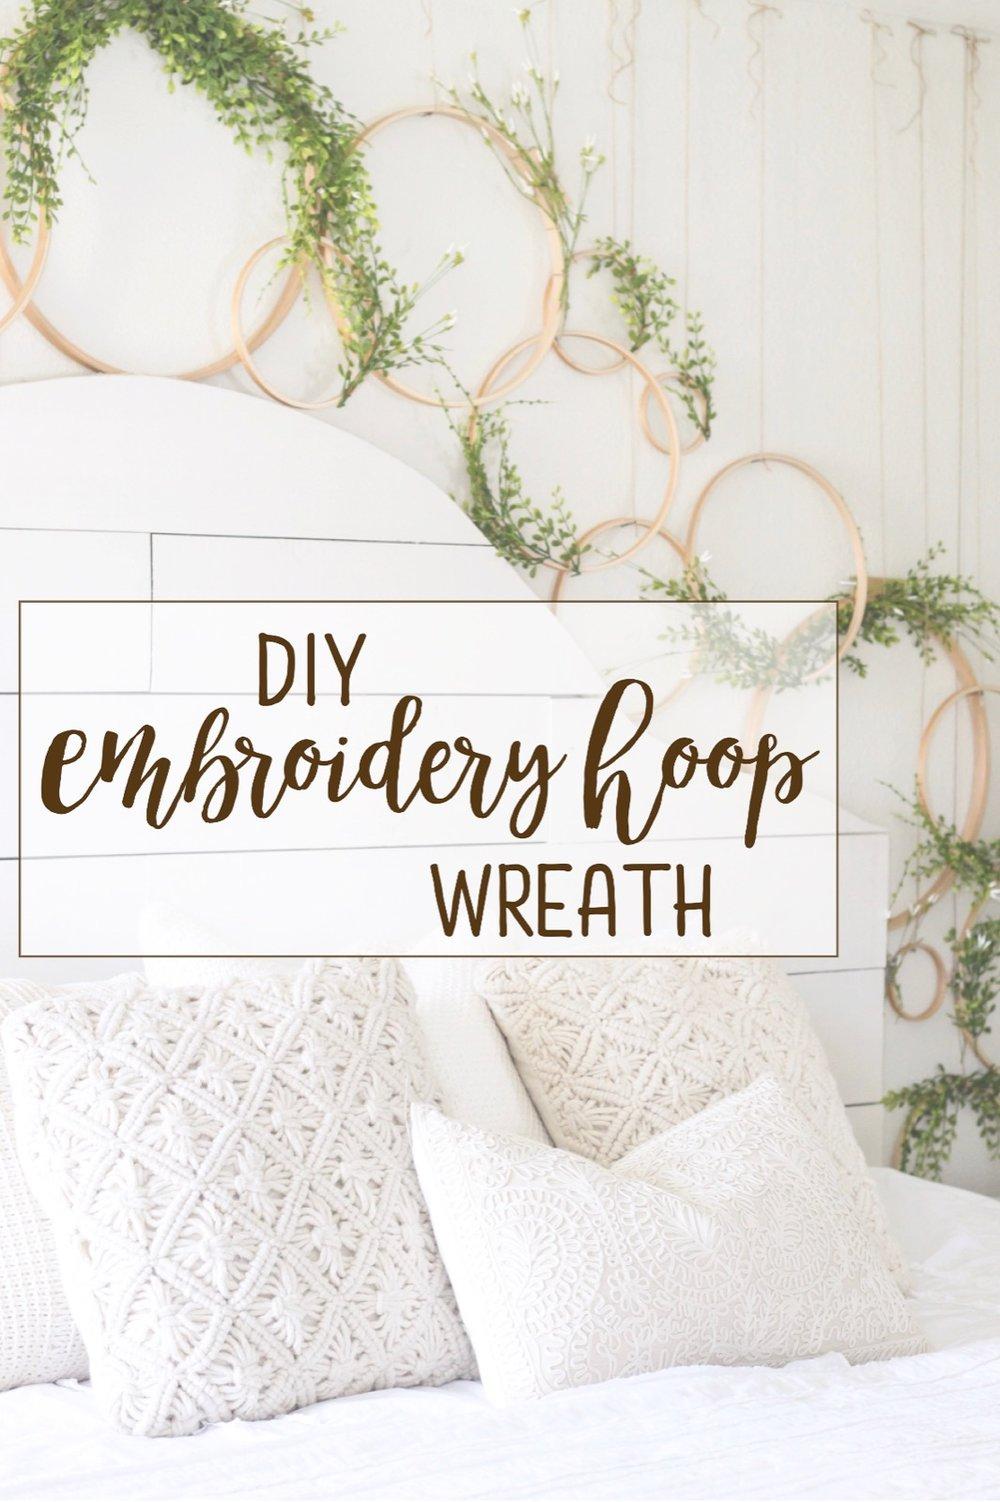 CottonStem.com embroidery hoop wreath diy spring decor.JPG